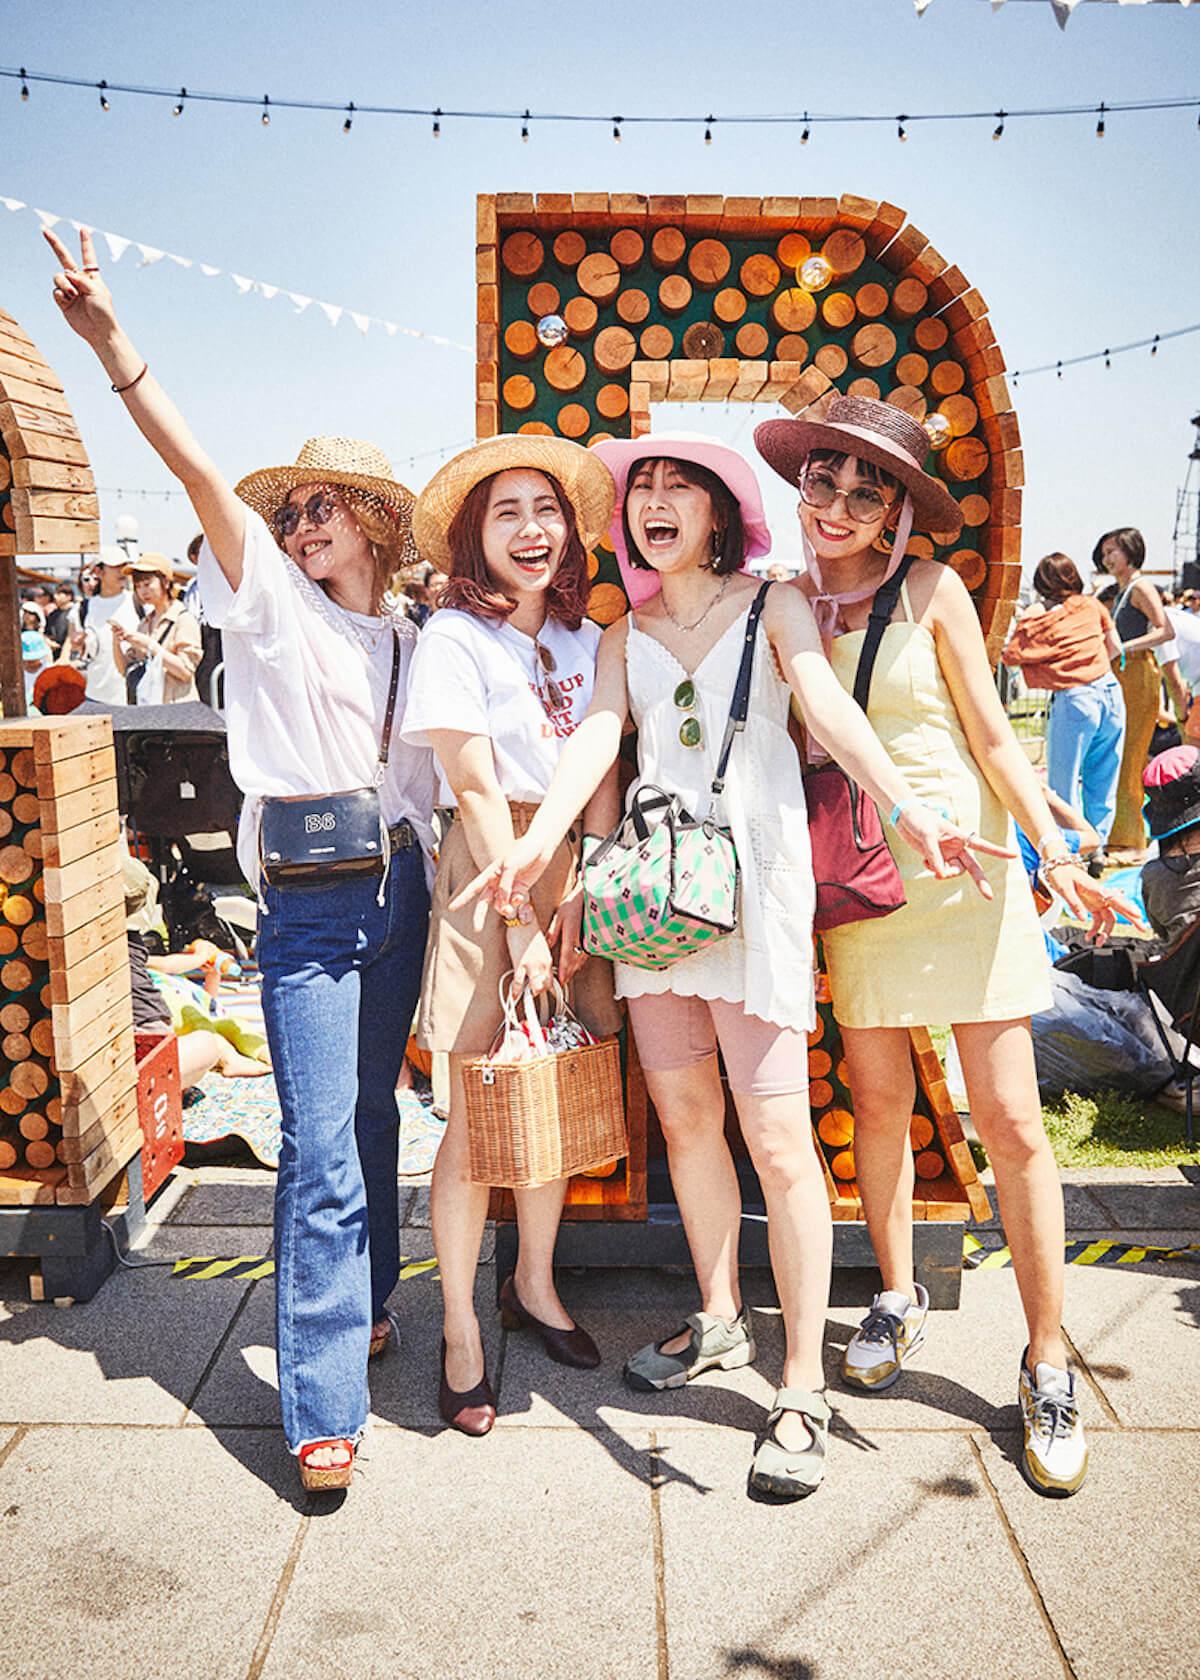 【GREENROOM FESTIVAL'19】夏を先取りしたフェスファッションスナップ! 9